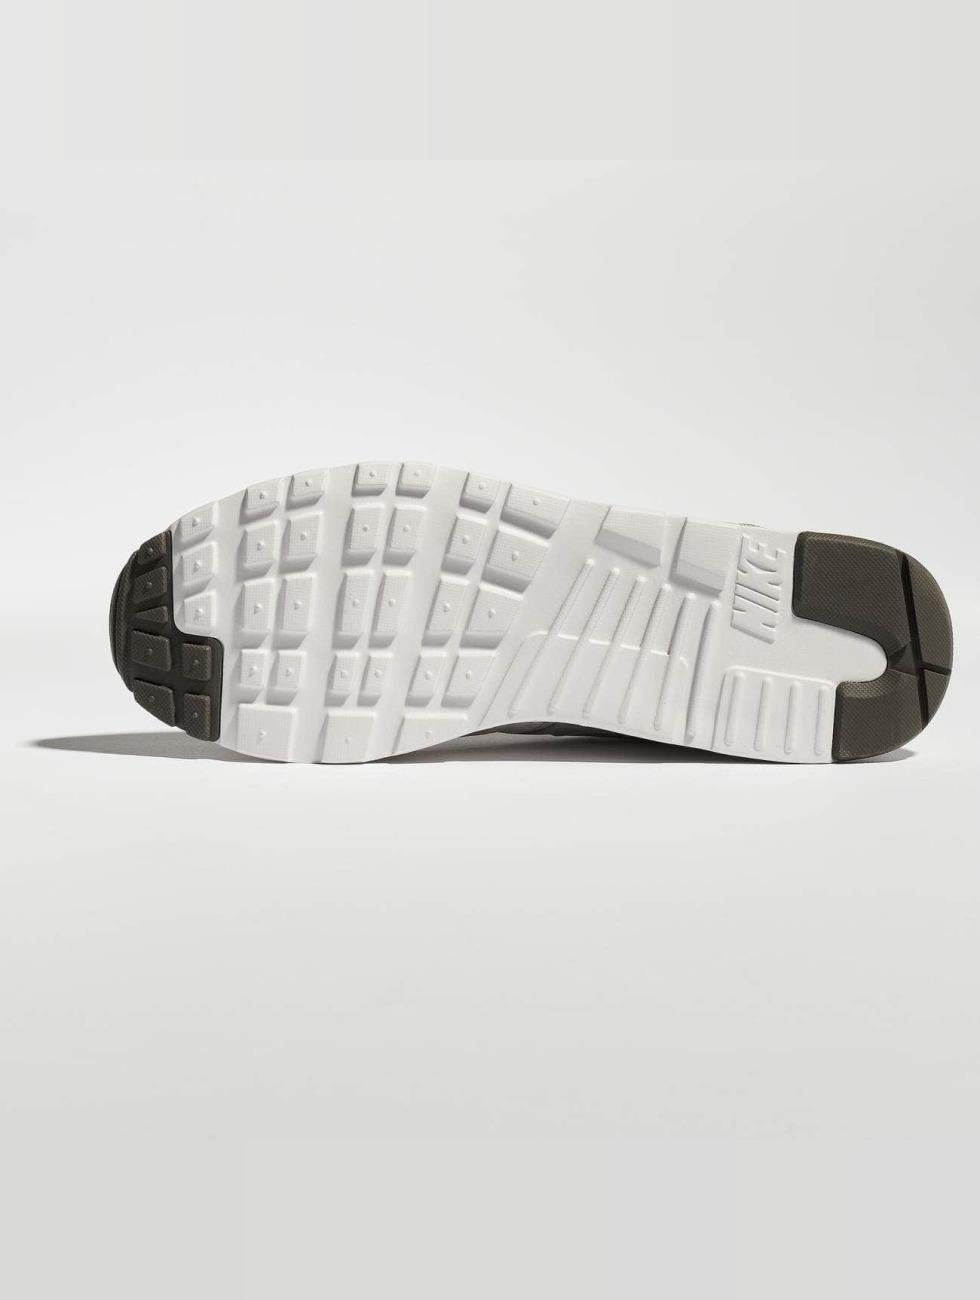 Nike schoen / sneaker Air Max Vision SE in beige 442657 Snelle Levering Goedkope Prijs Wiki Online Te Koop Klaring Goede Verkoop Korting Goedkoop Verkoop Uitstekend inATIK8J